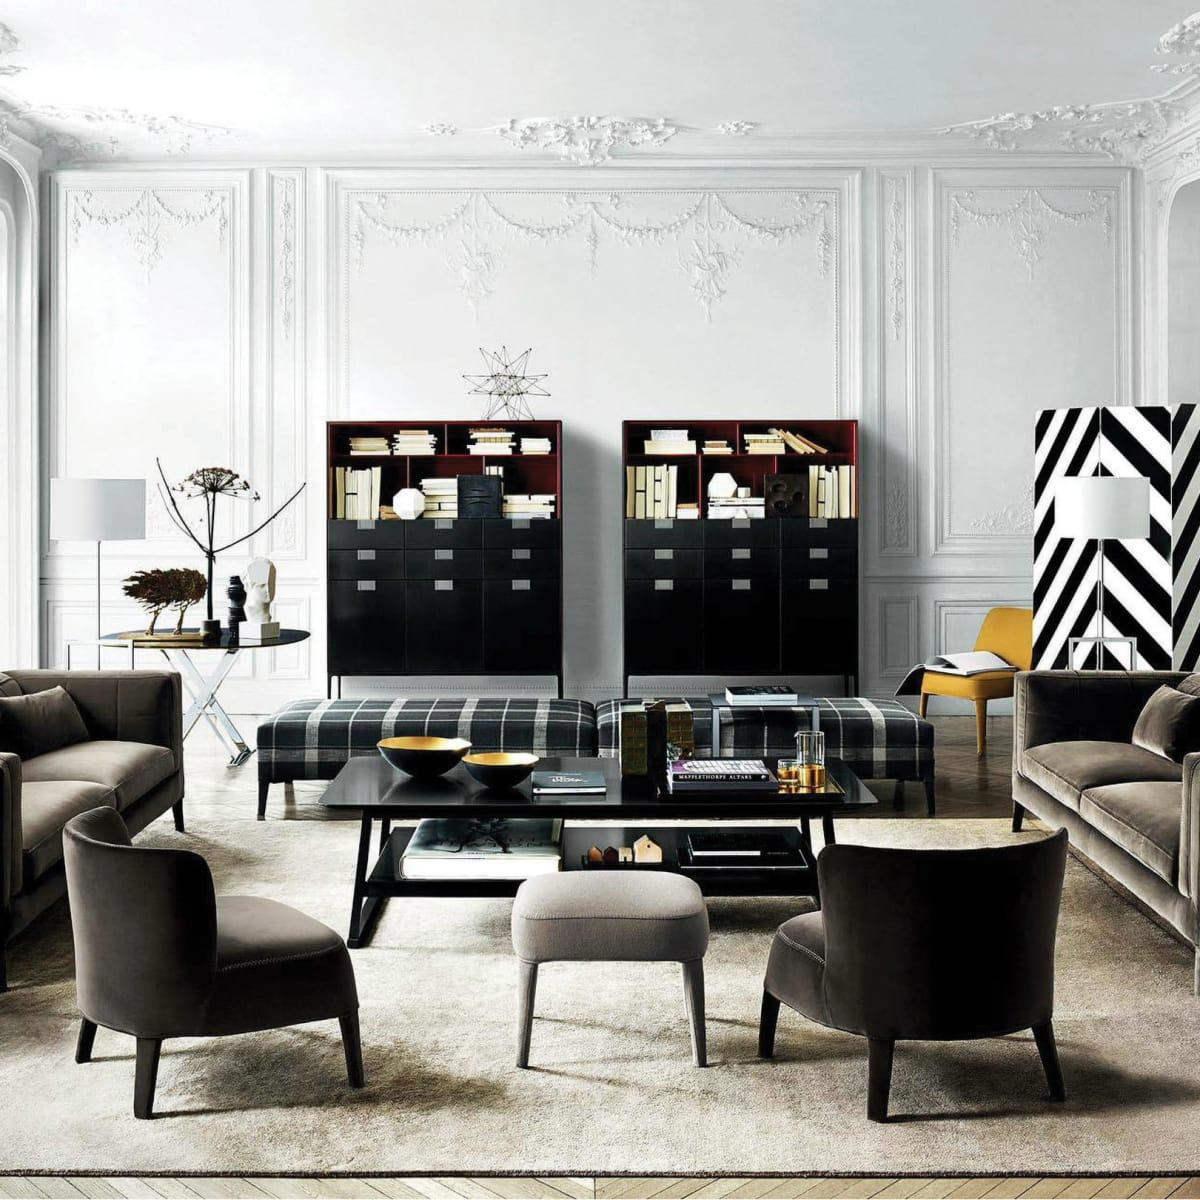 Maxalto furniture